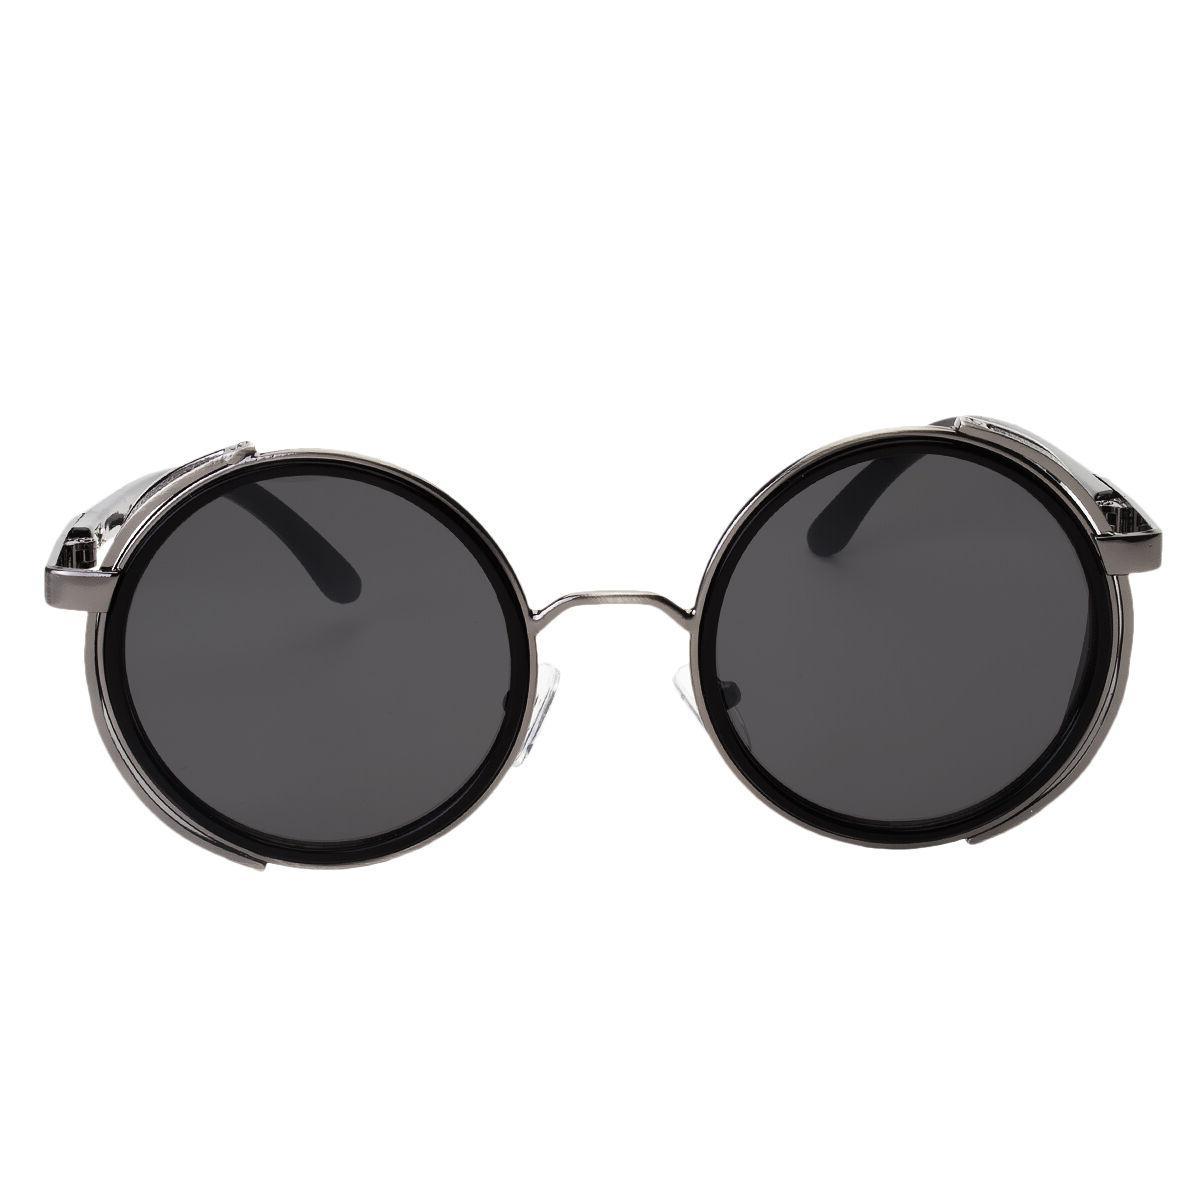 Vintage Sun Glasses Goggles Steampunk Punk Sunglasses